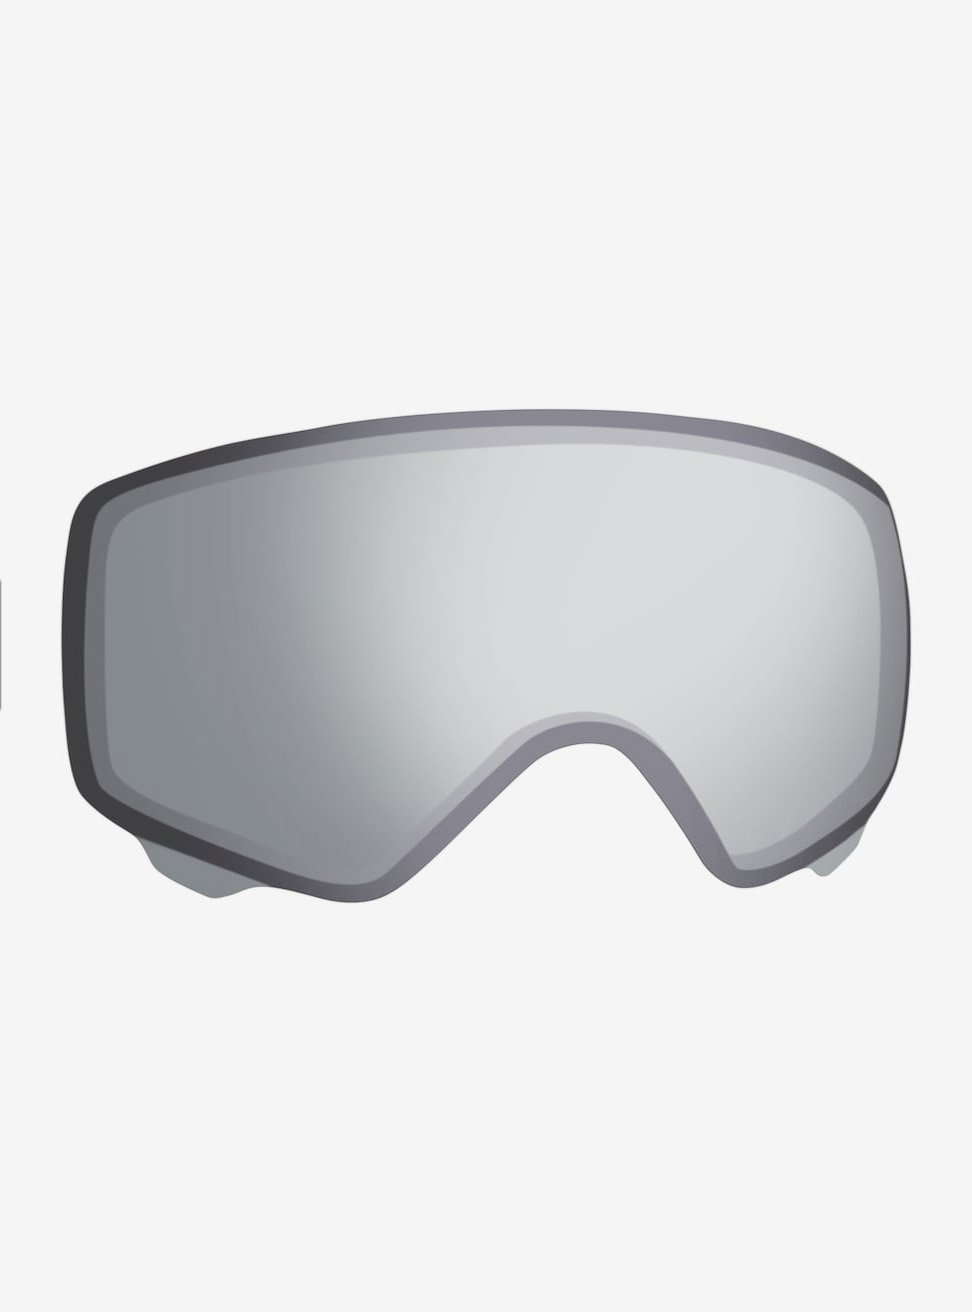 Anon WM1 Goggle Lens (Multiple Color Options)